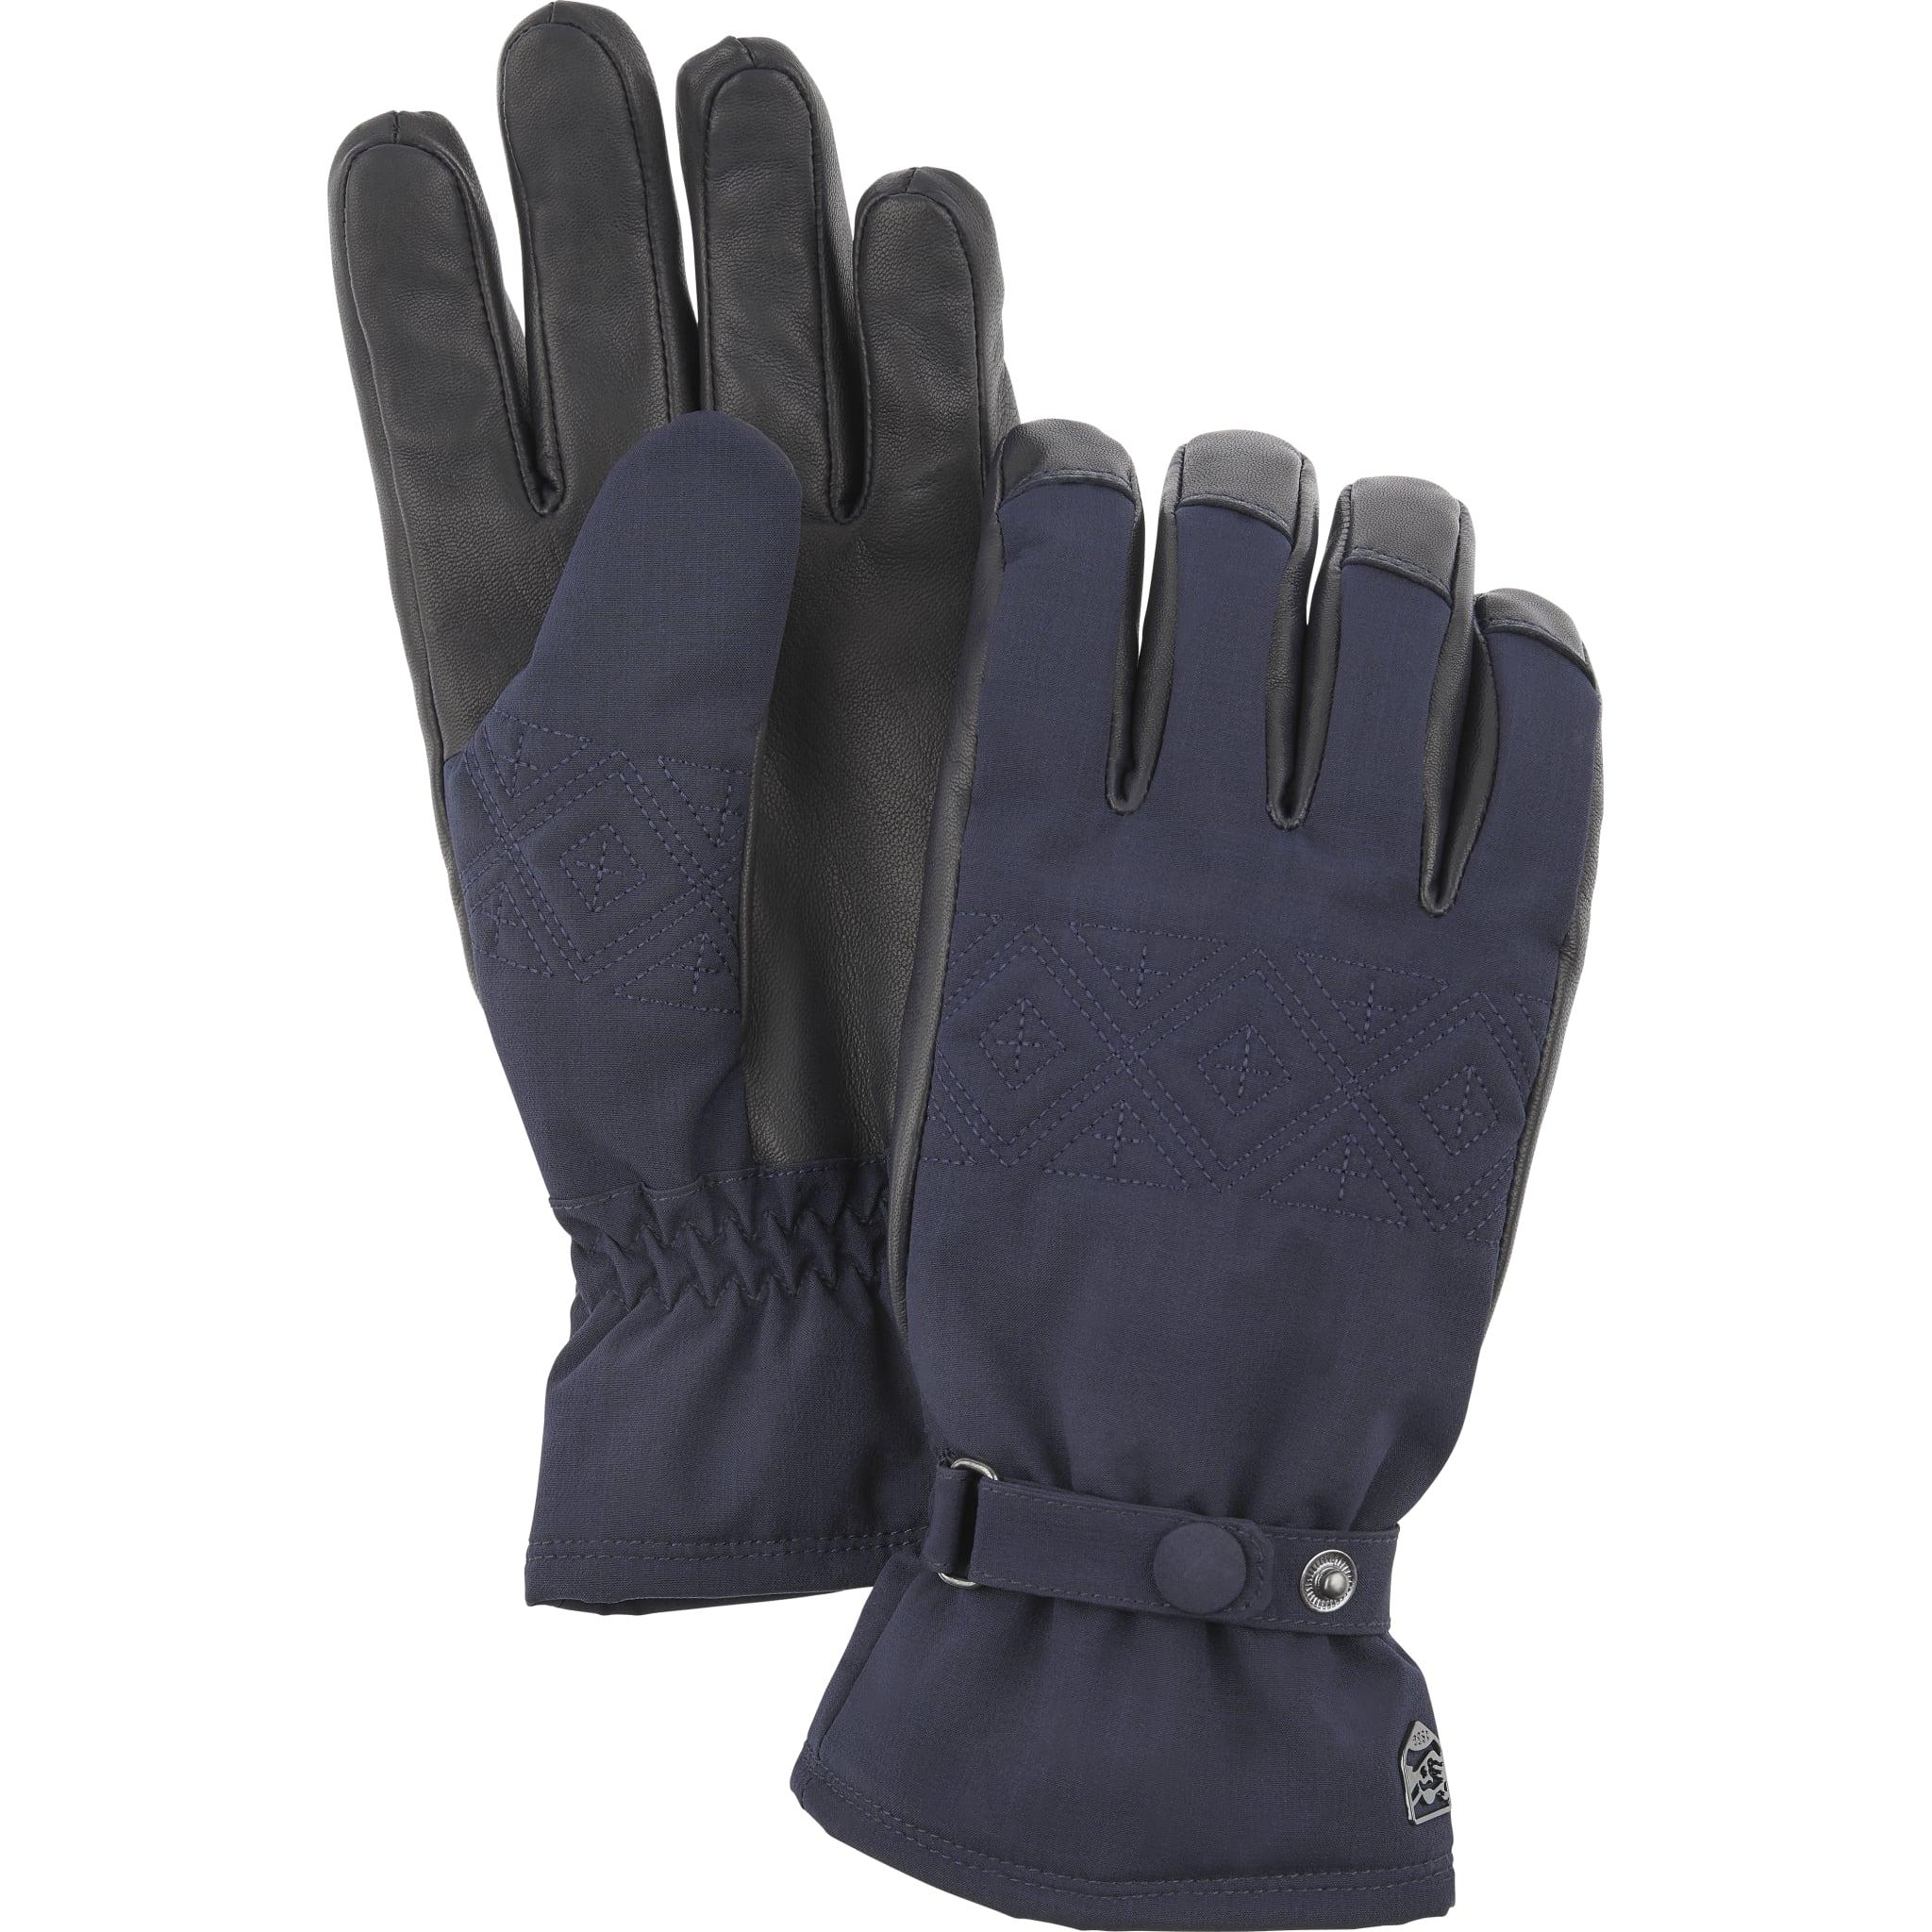 Swisswool Inverno Gloves W